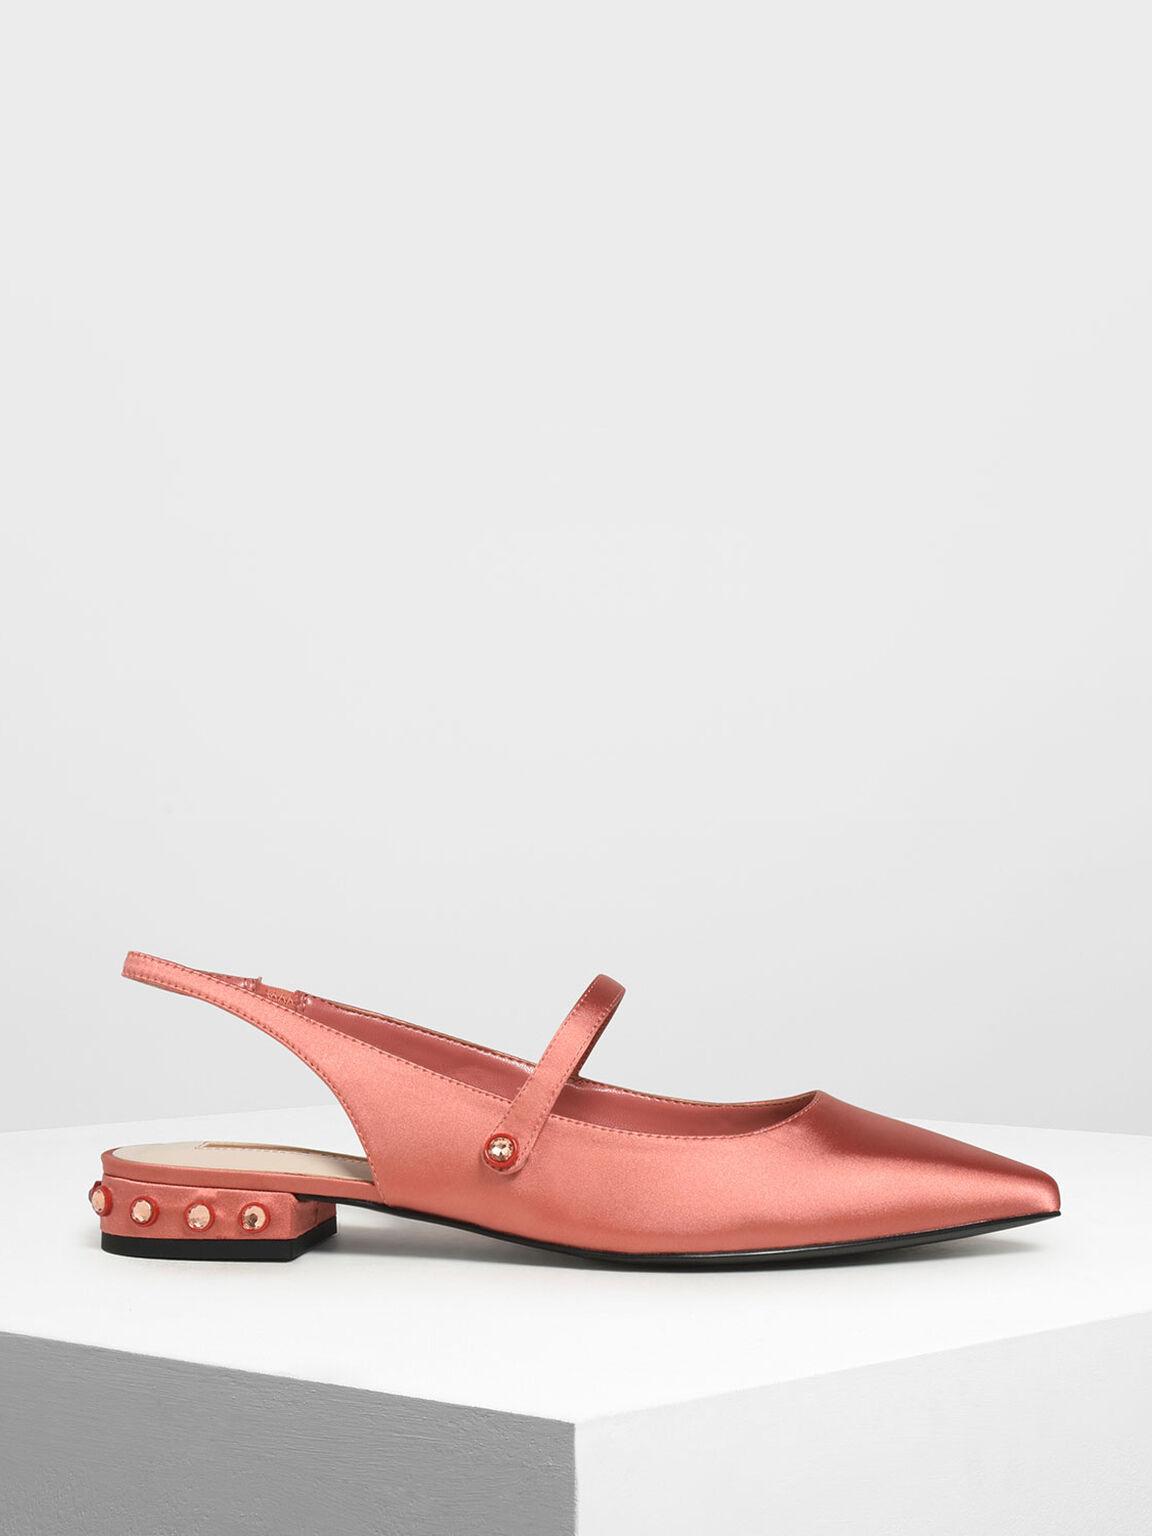 Bejeweled Heel Slingback Flats, Coral Pink, hi-res